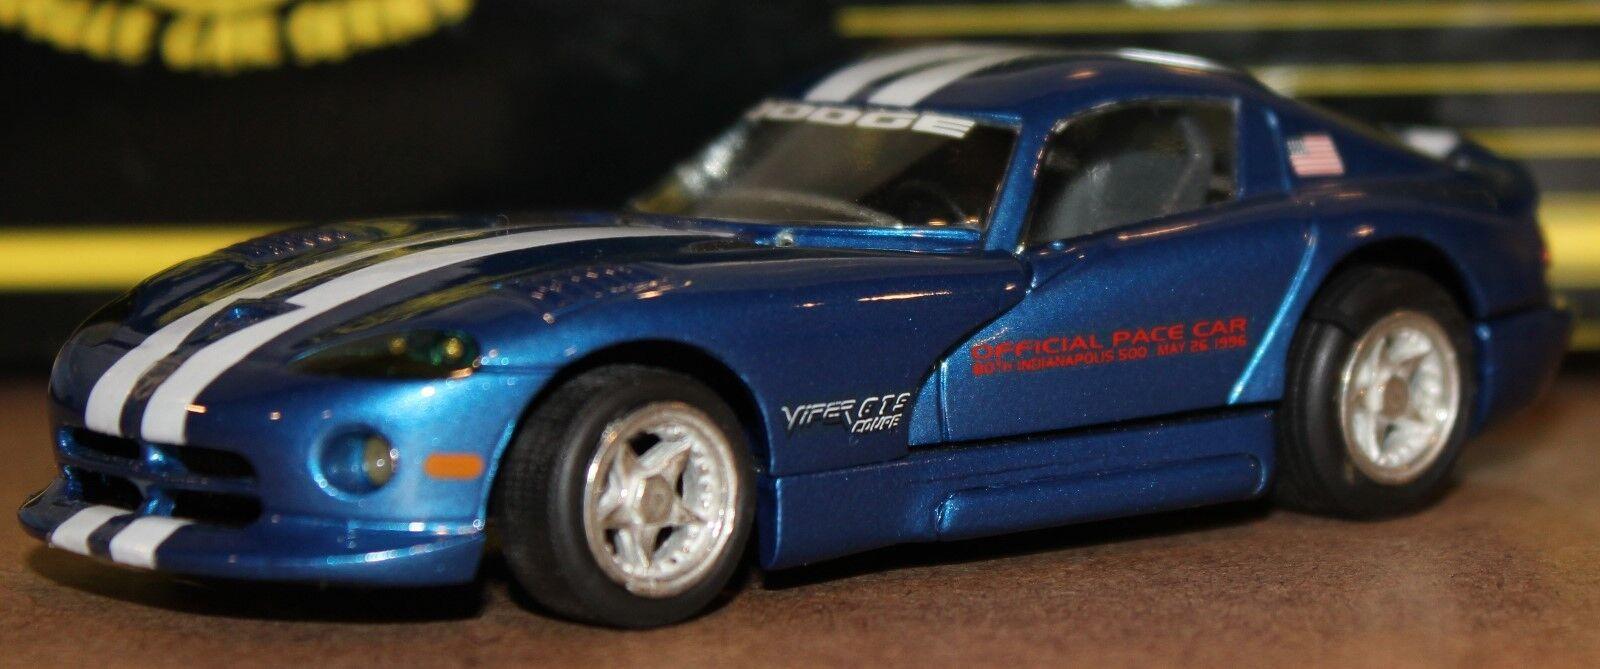 PTH Western Models 16P 1996 Dodge Viper GTS Indianapolis Pace Car bianca Metal